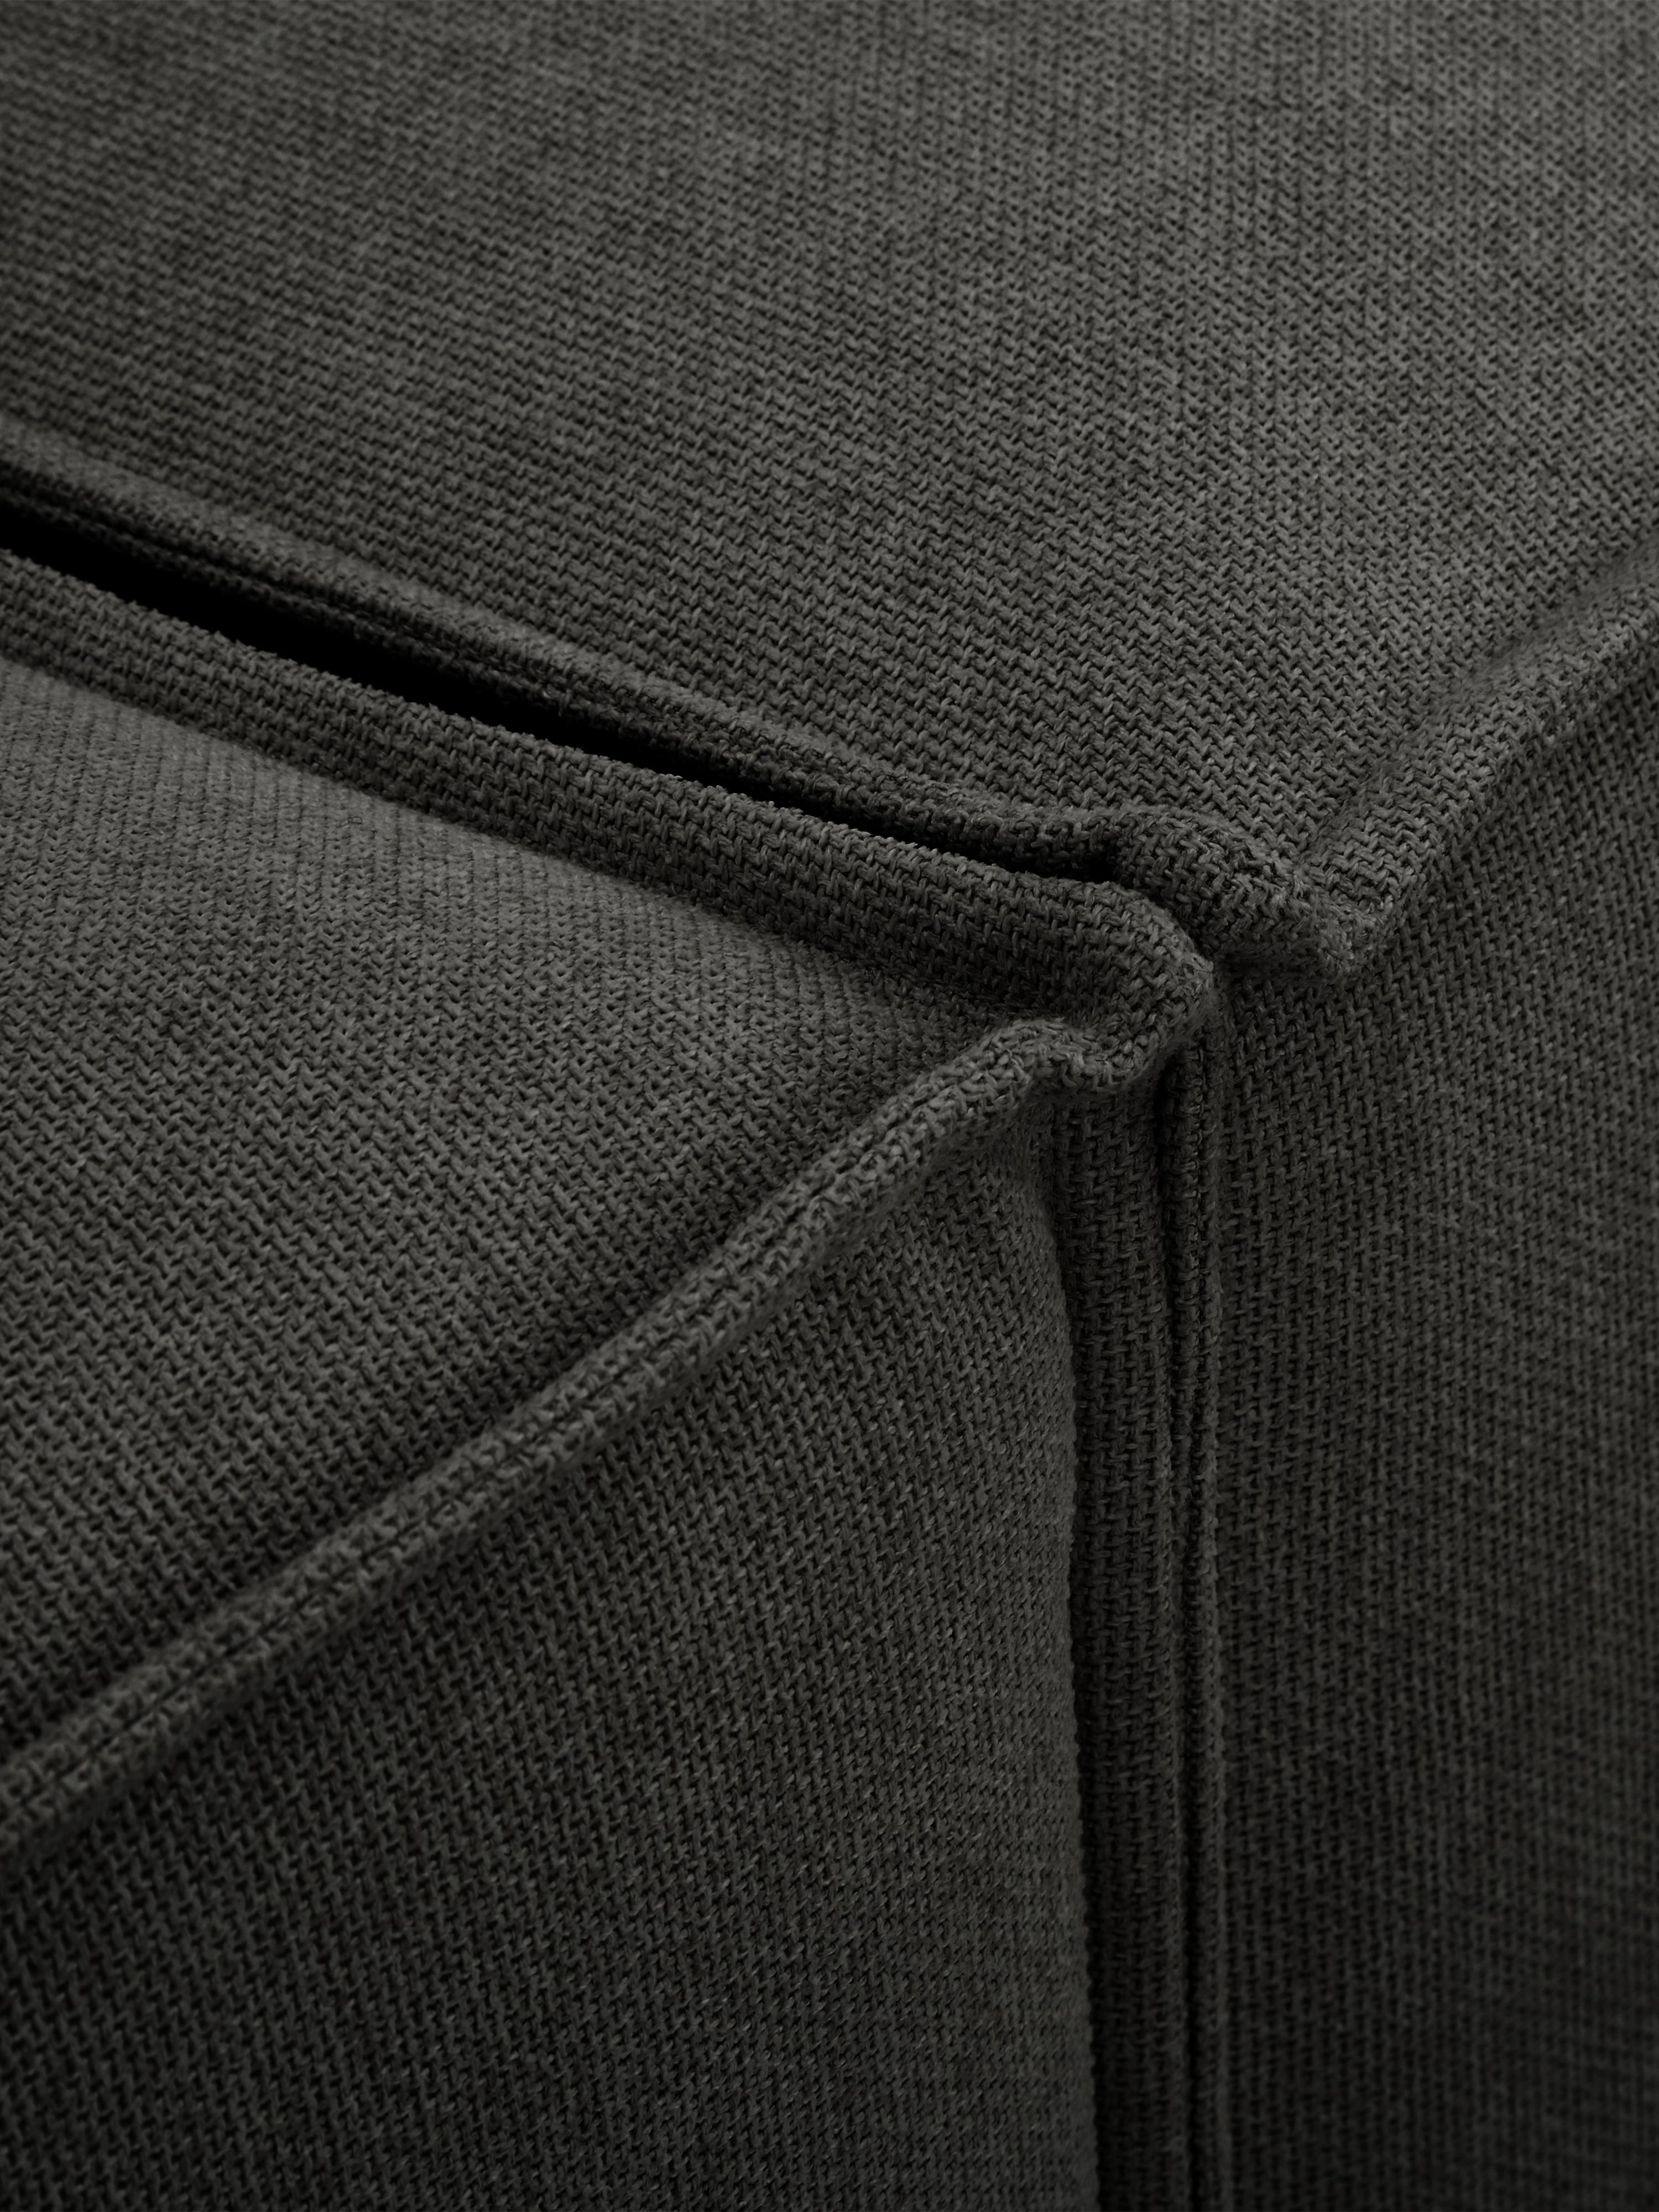 Modulares Sofa Lennon (3-Sitzer), Bezug: Polyester Der hochwertige, Gestell: Massives Kiefernholz, Spe, Füße: Kunststoff, Webstoff Anthrazit, B 238 x T 119 cm